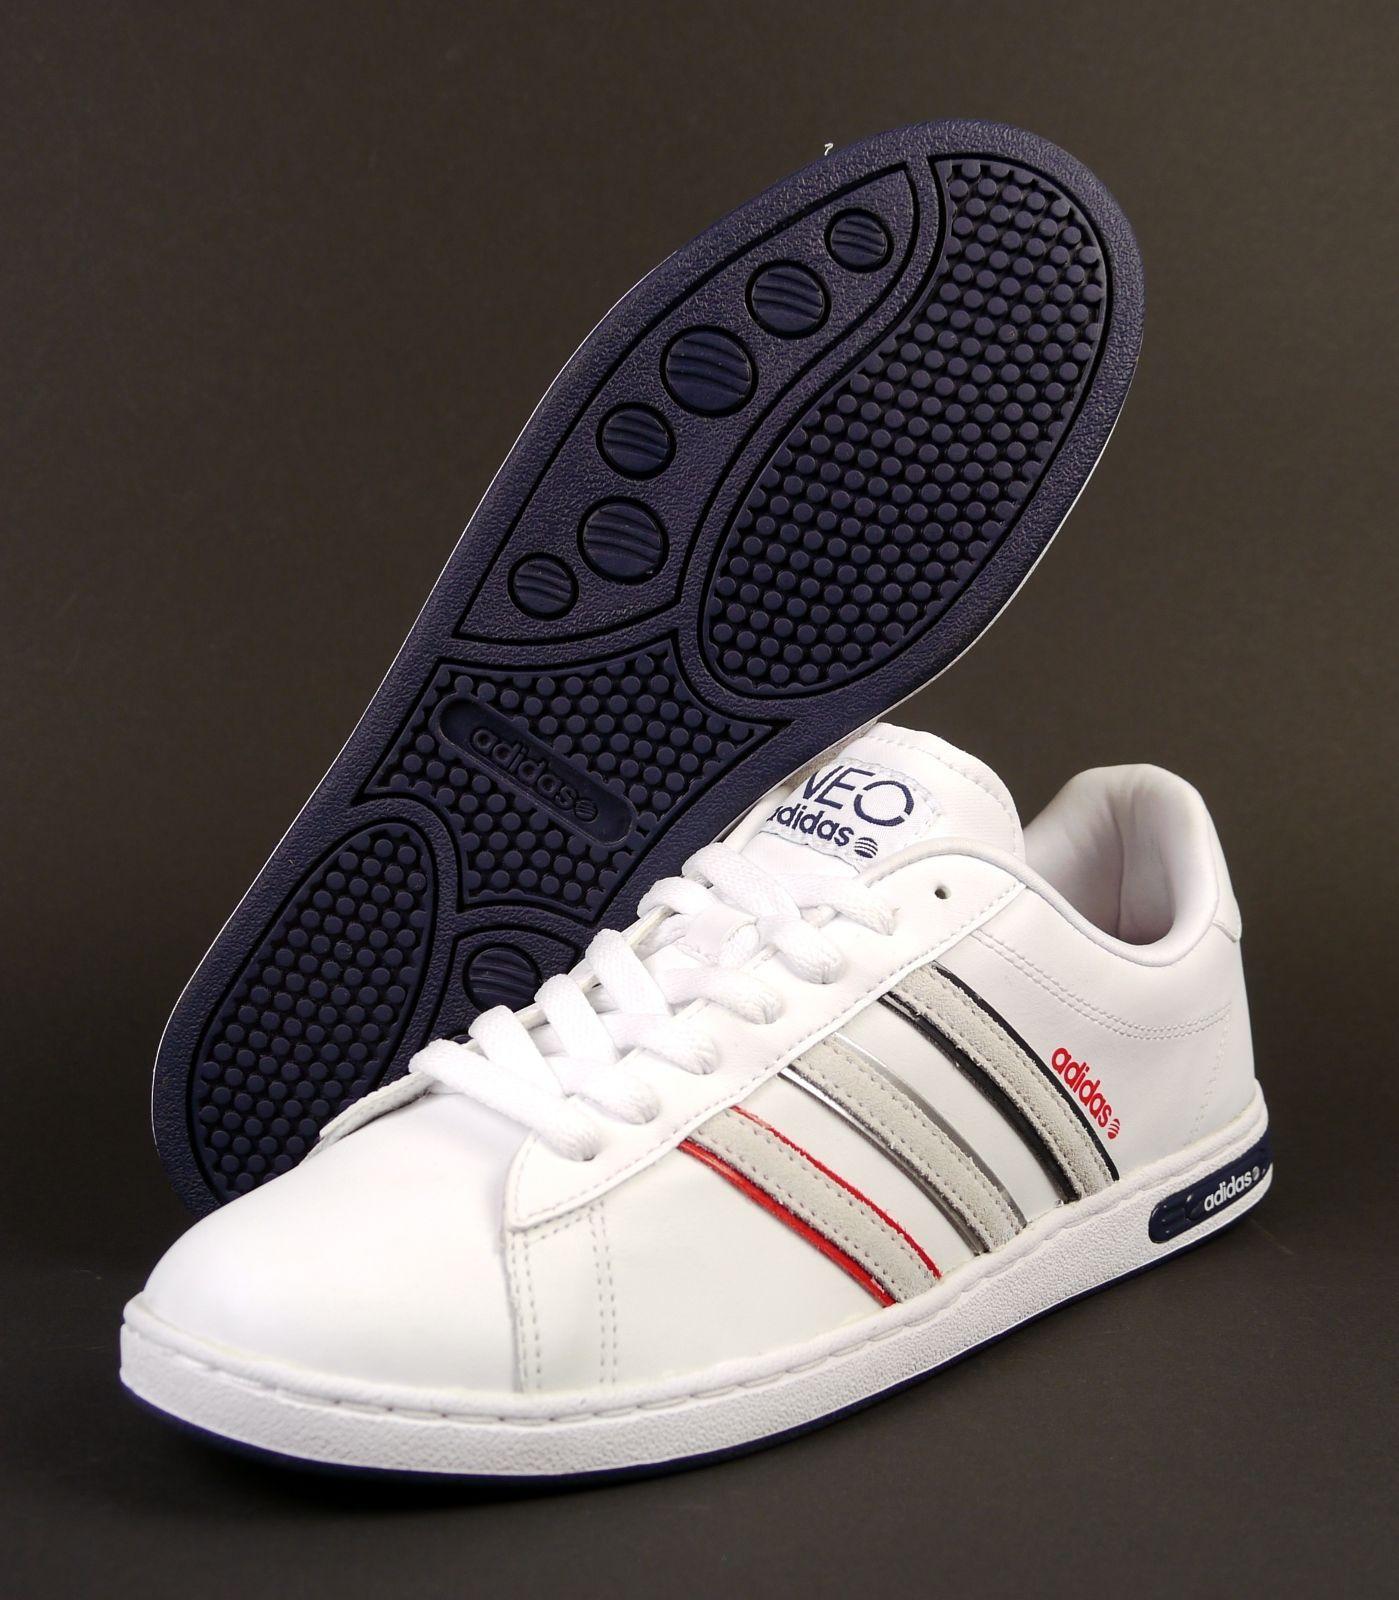 Adidas neo Derby II le hombres weiß formadores zapatilla Leder http: / / www